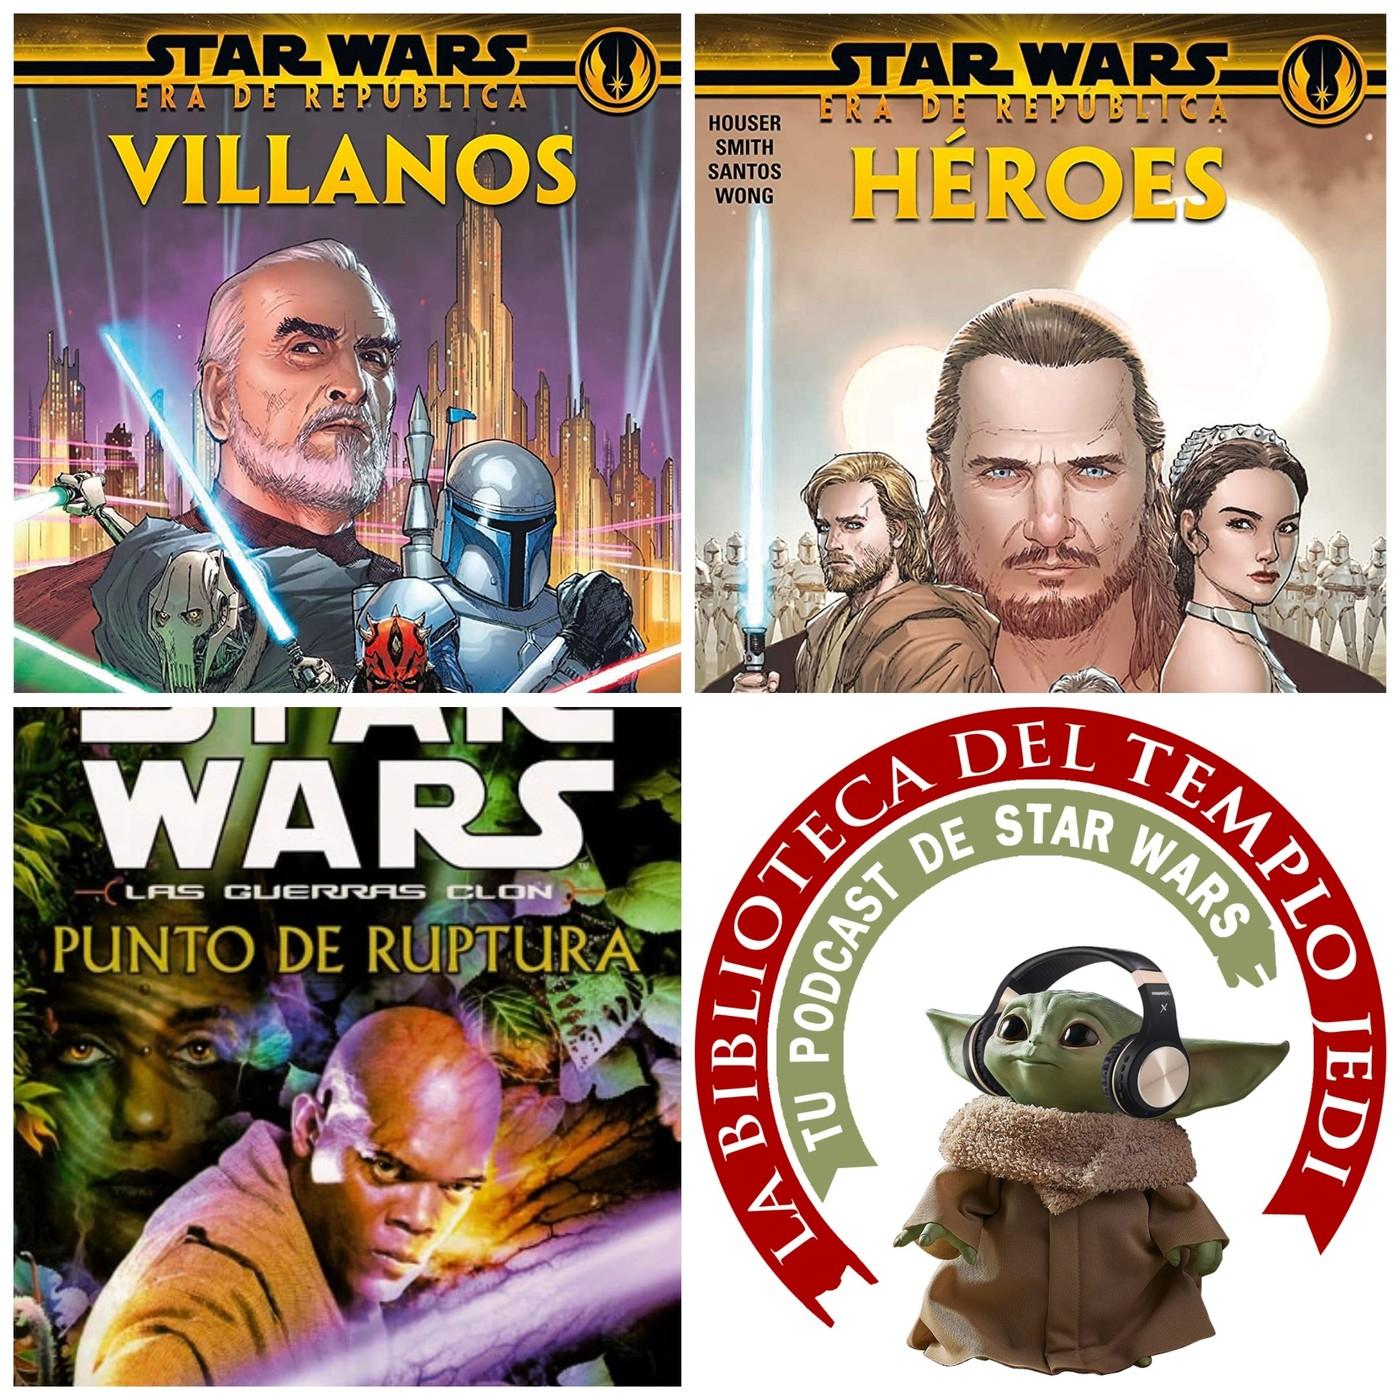 El Podcast de La Biblioteca del Templo Jedi 4x03